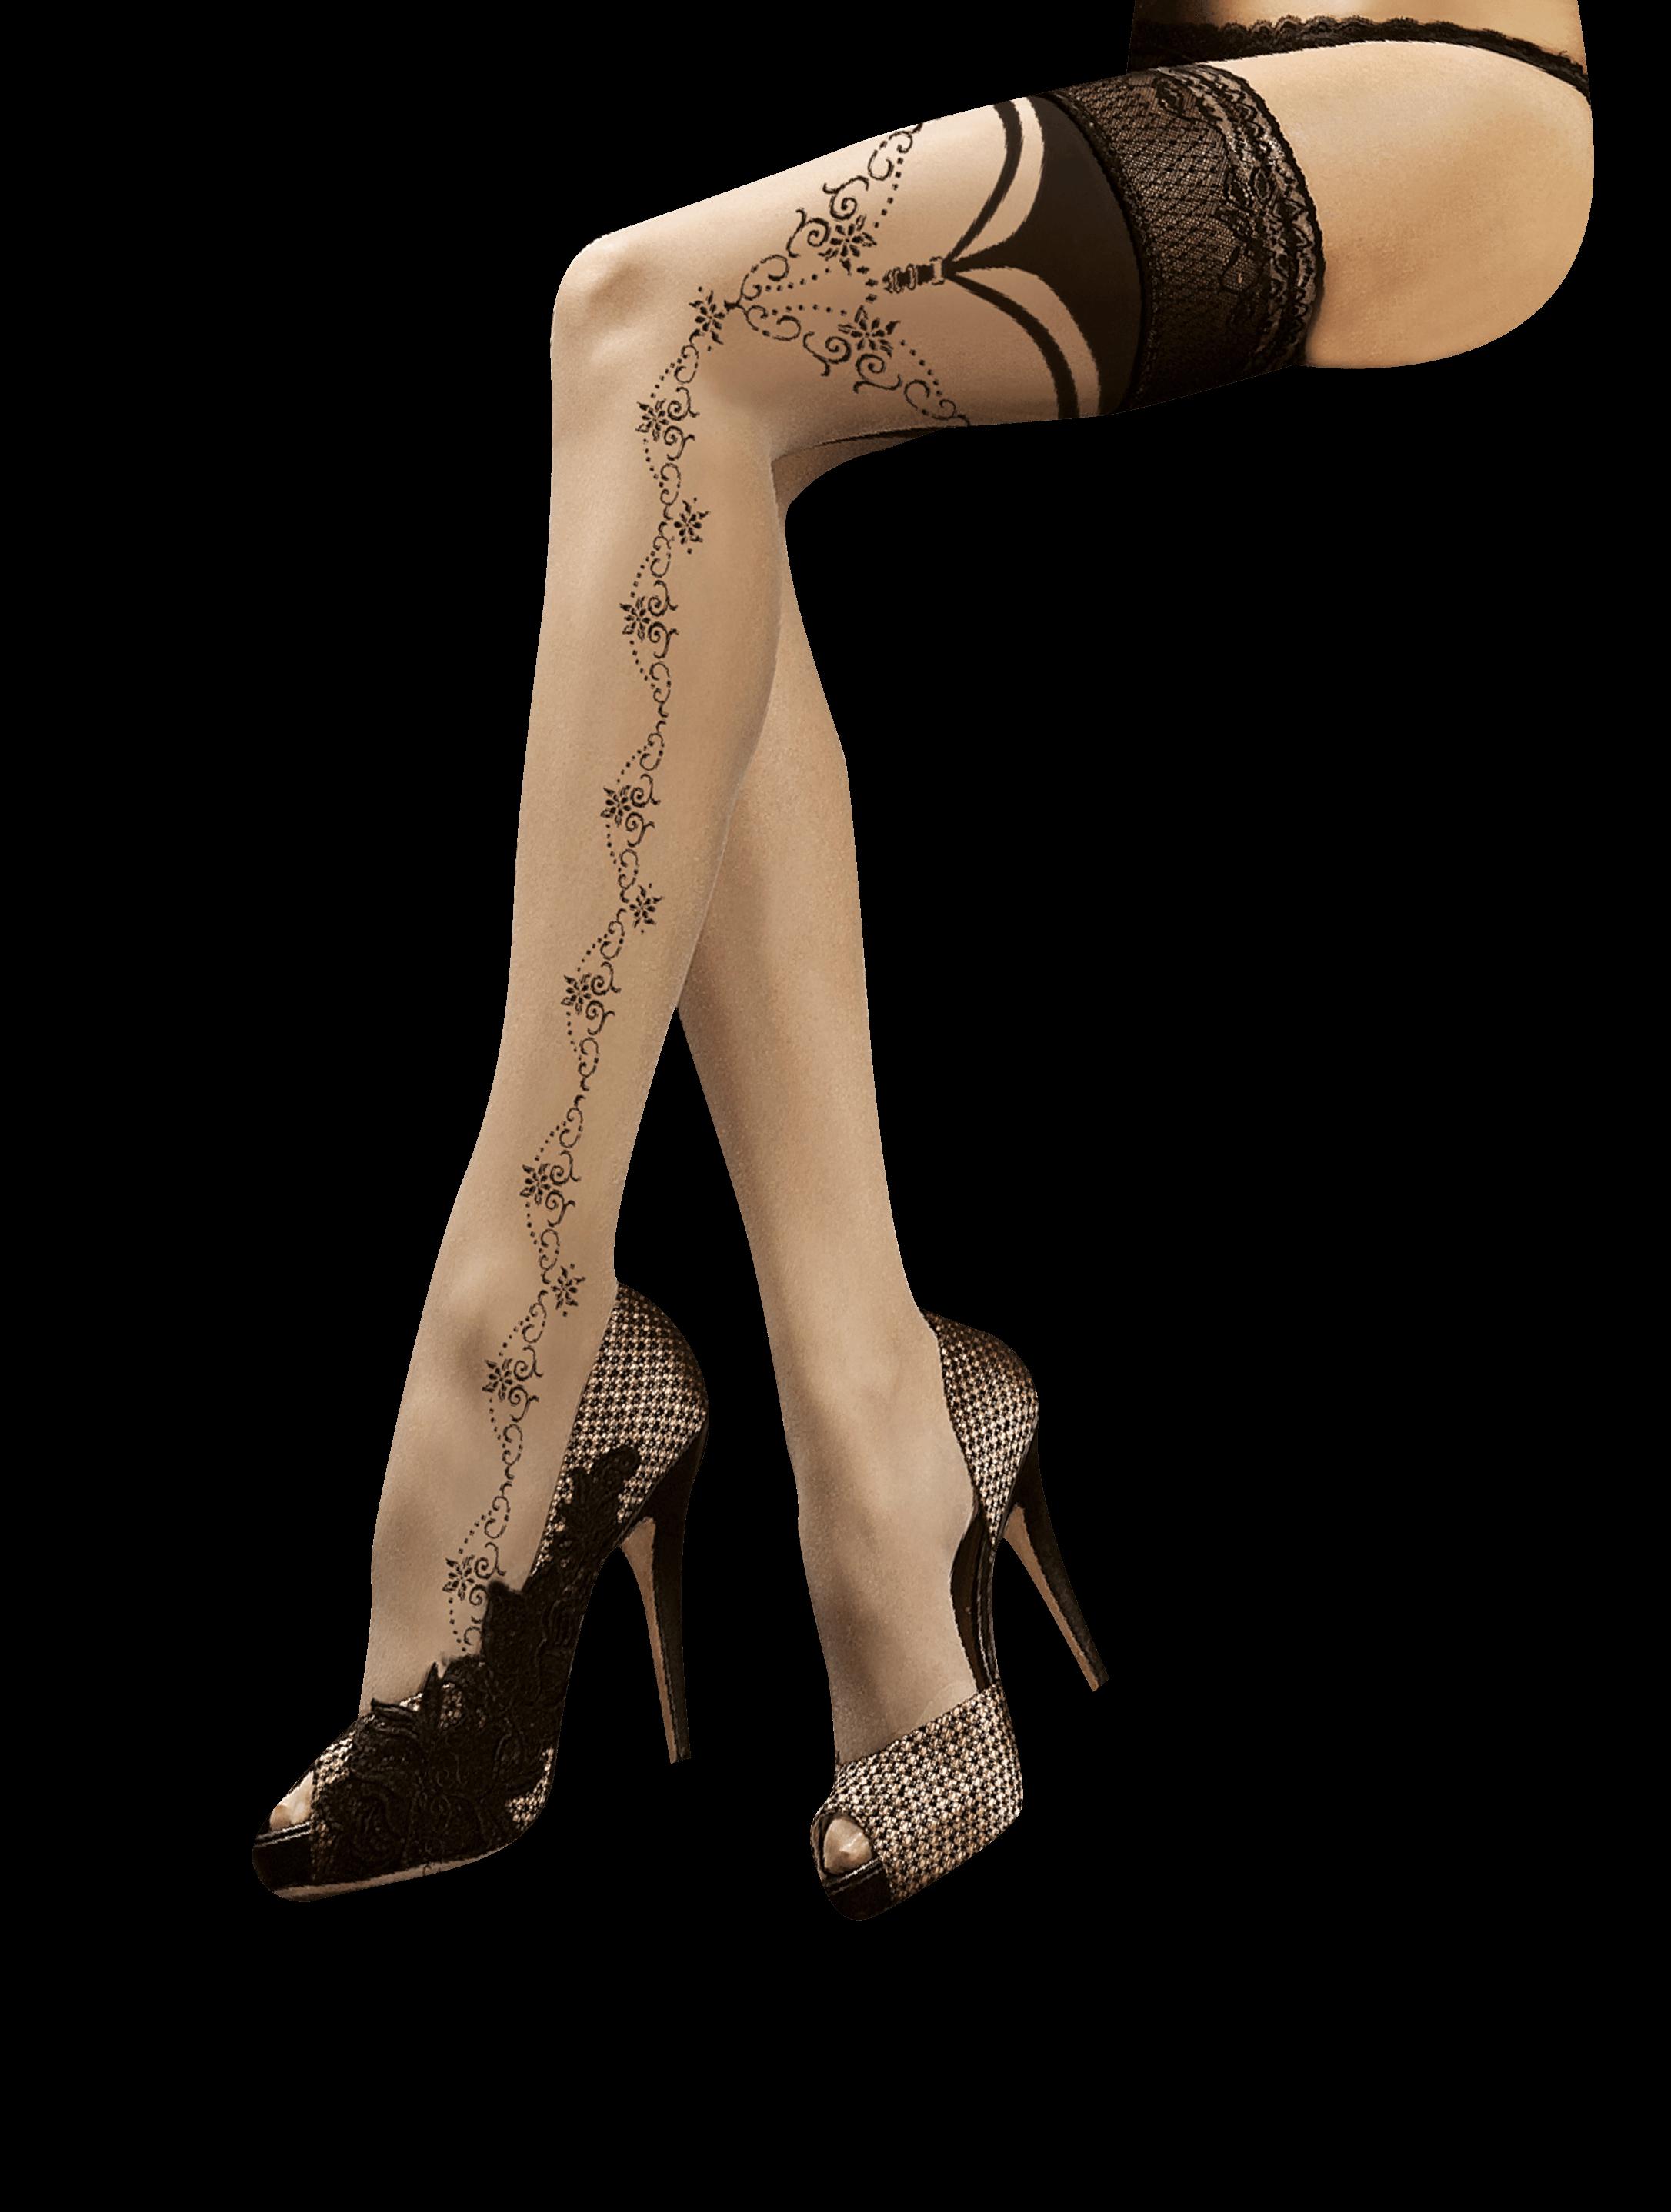 Halterlose Strumpfe Mit Silikonband Burlesque Dessous De